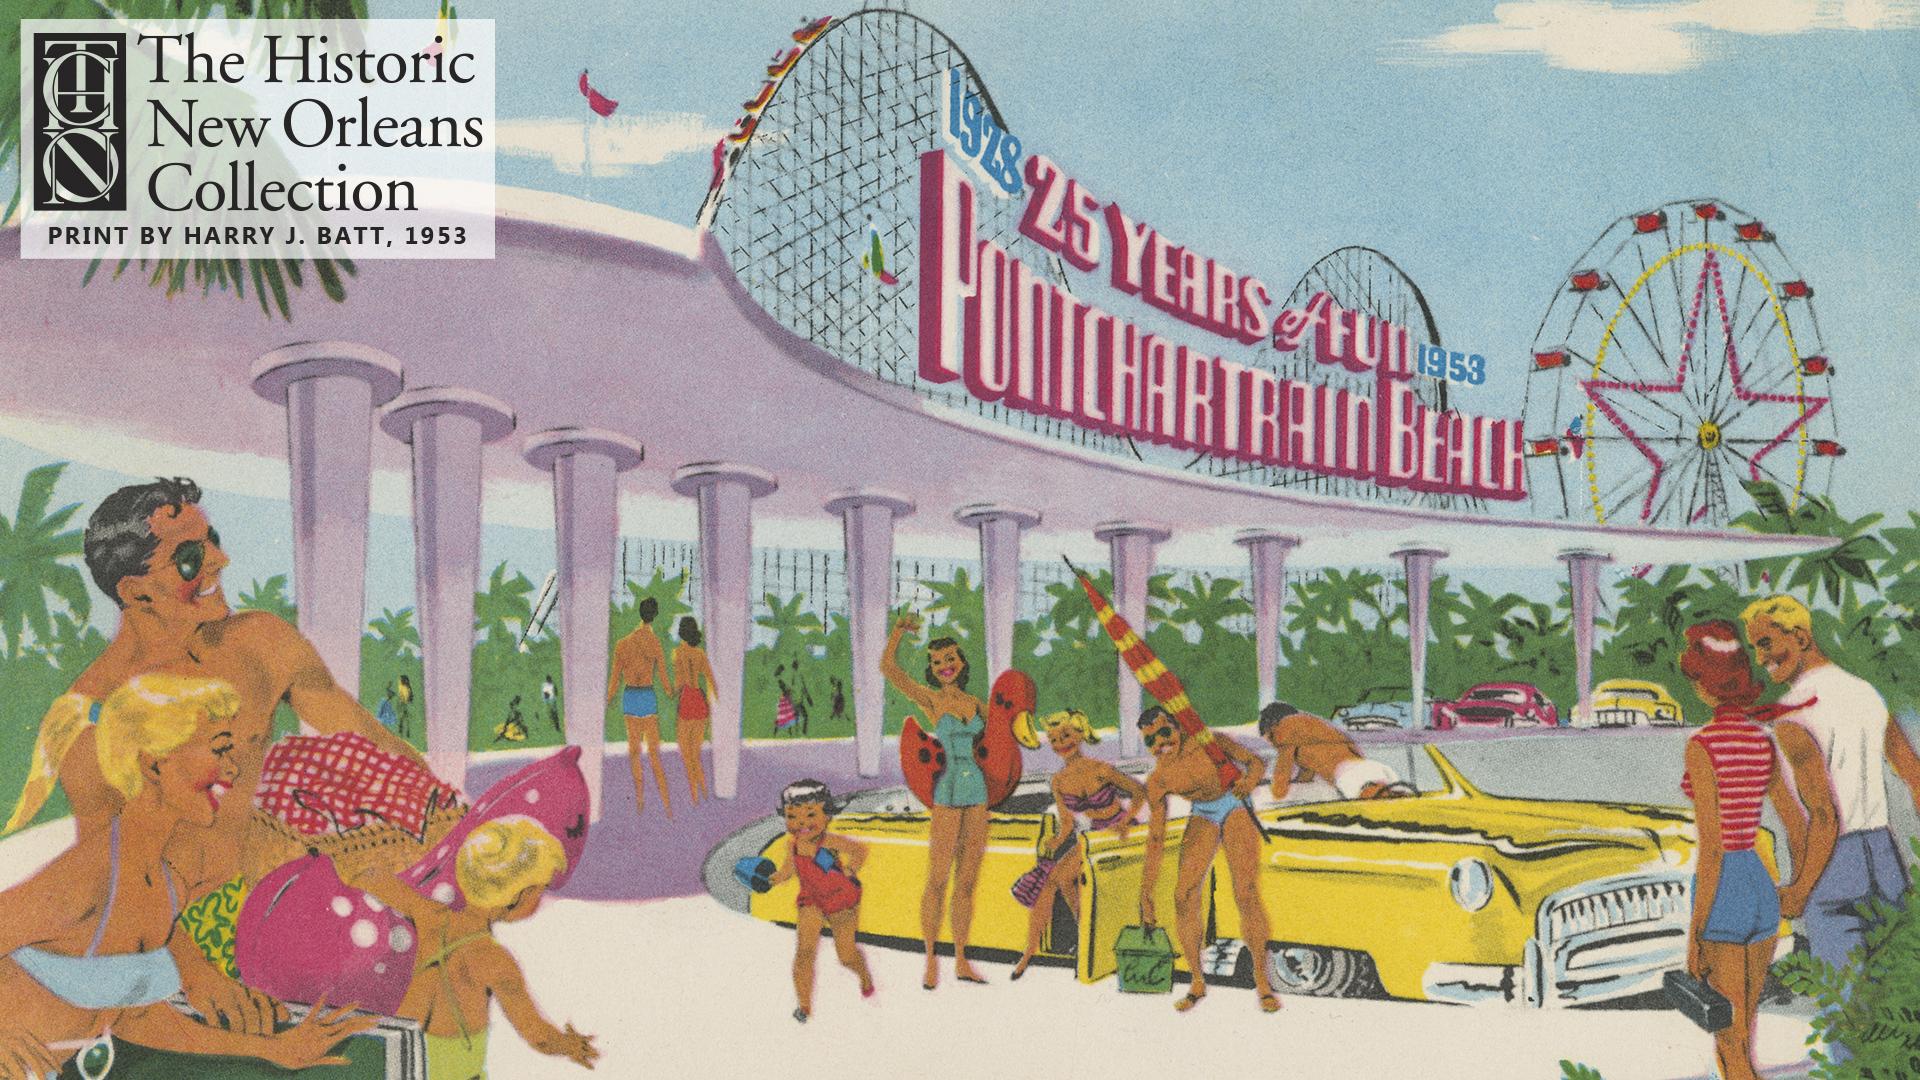 Pontchartrain Beach: 25 Years of Fun